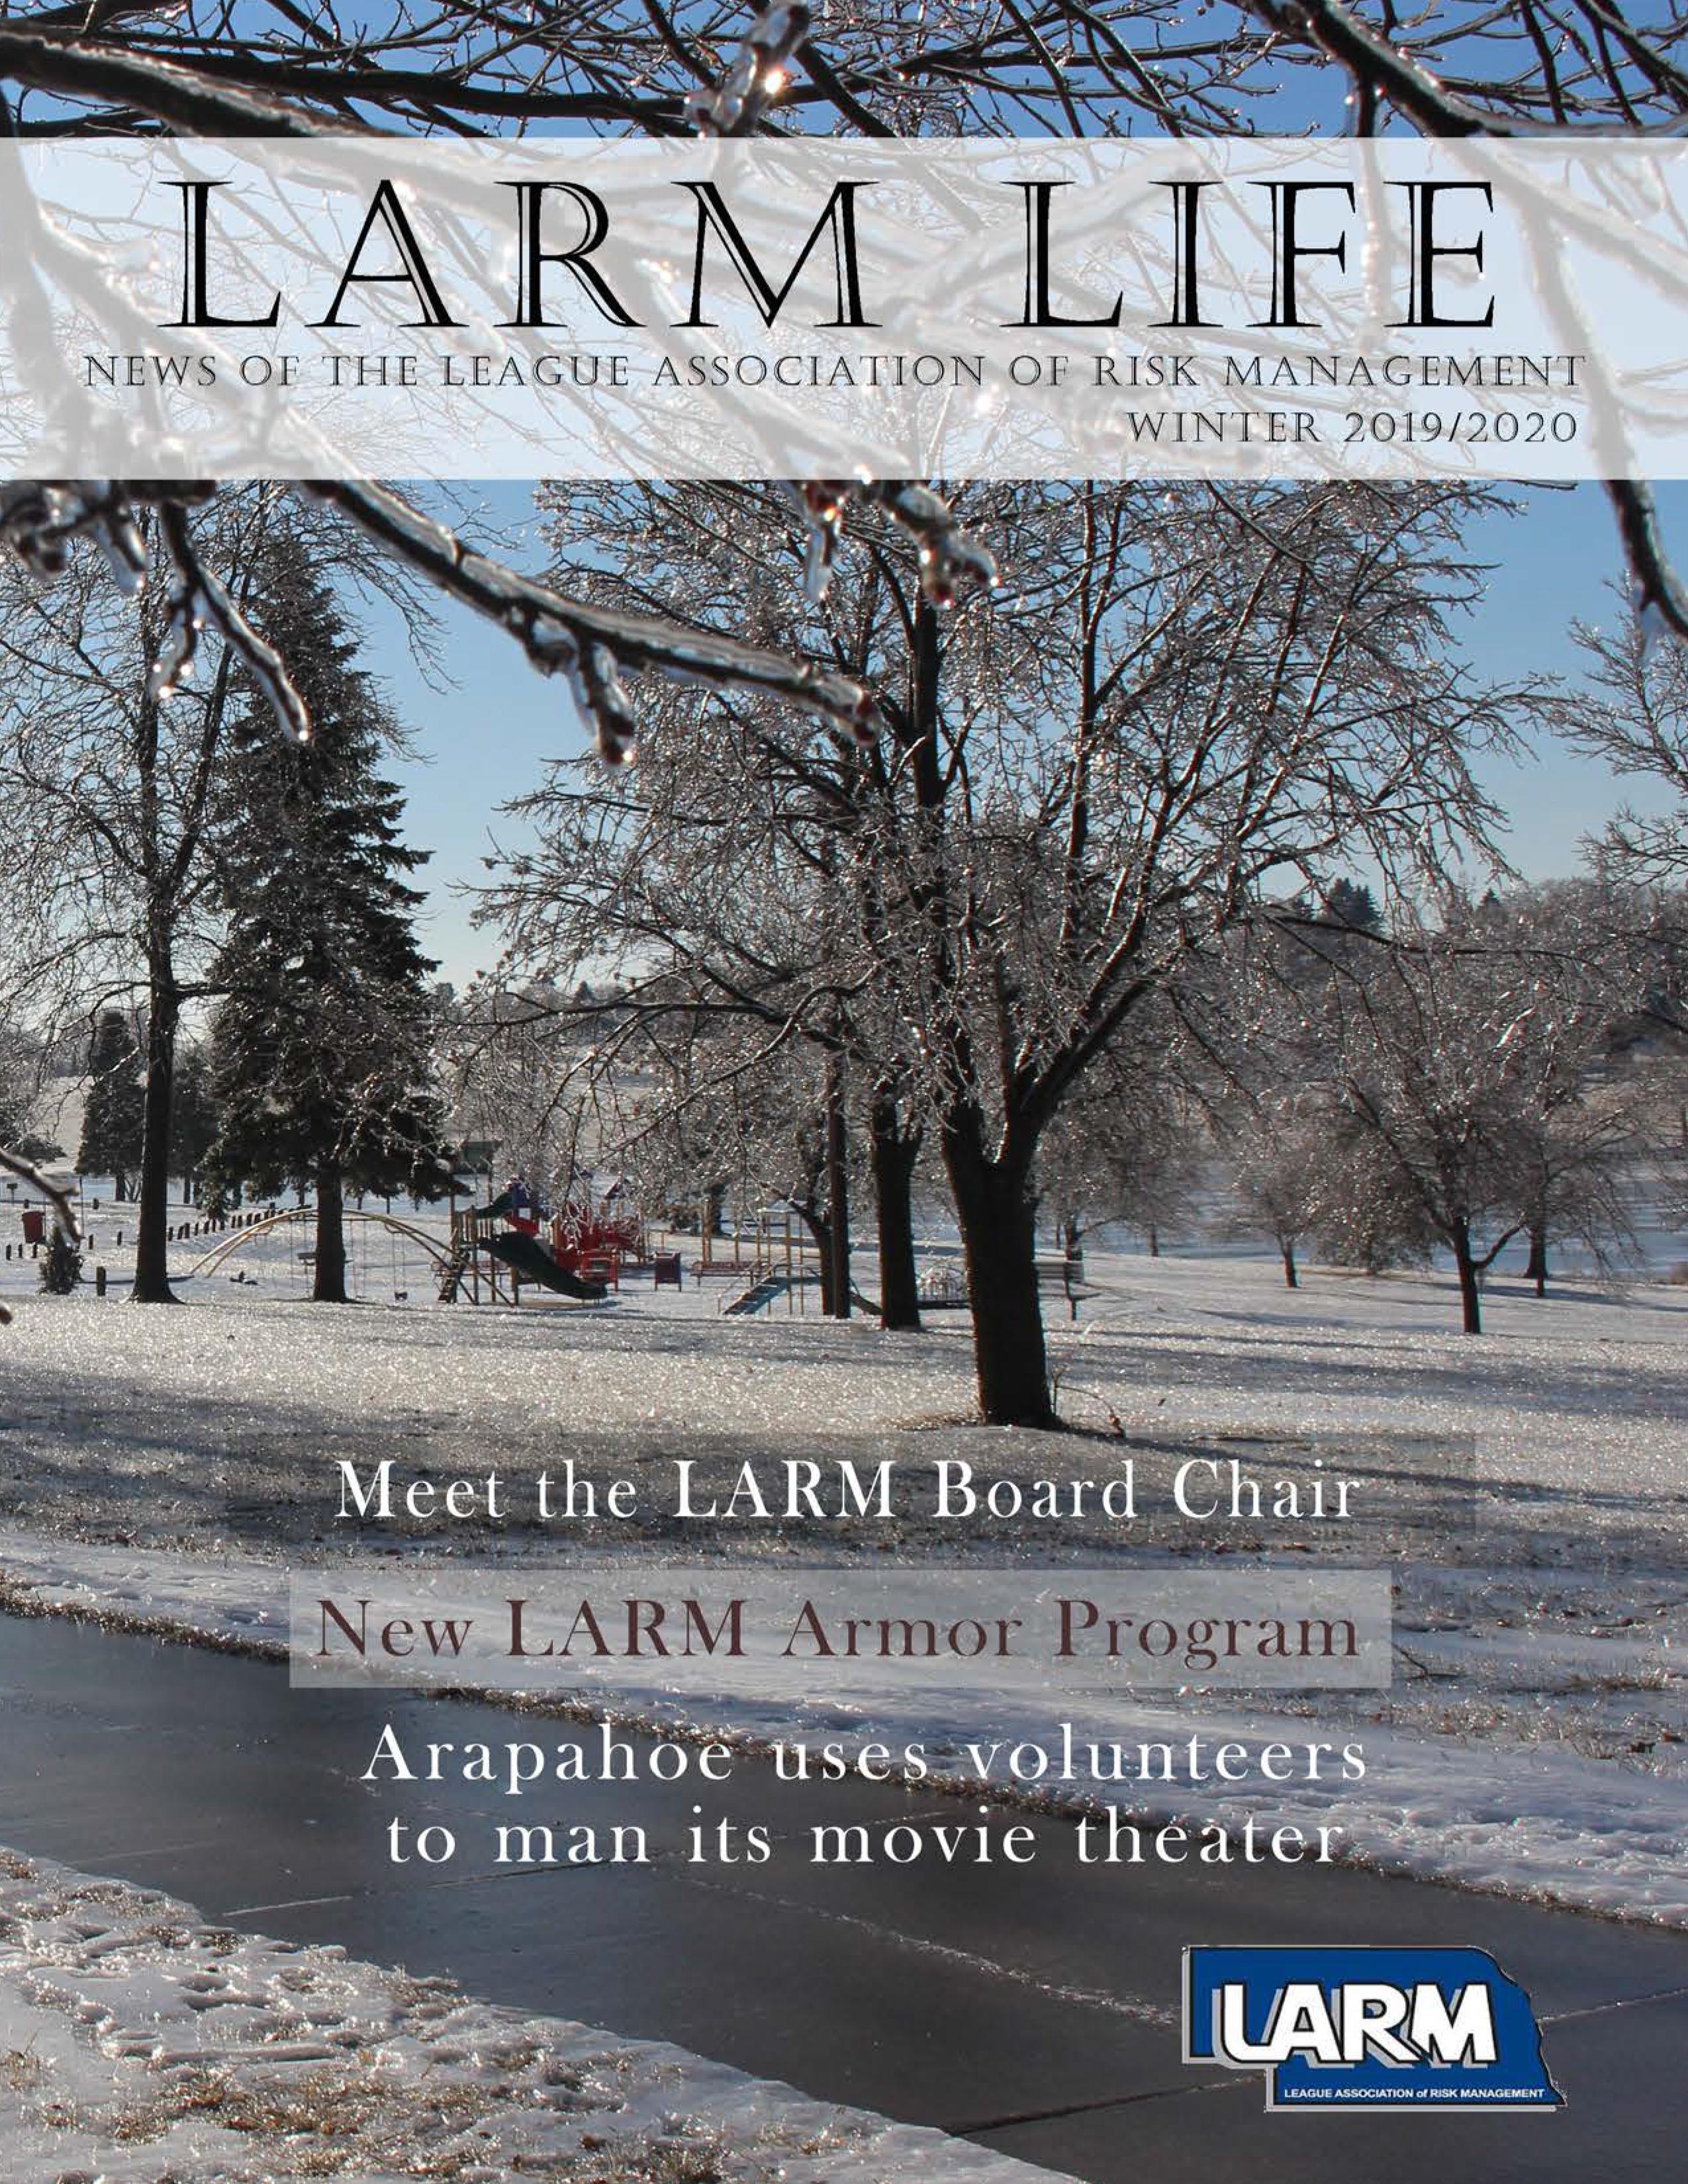 LARM Life Winter 2019-2020